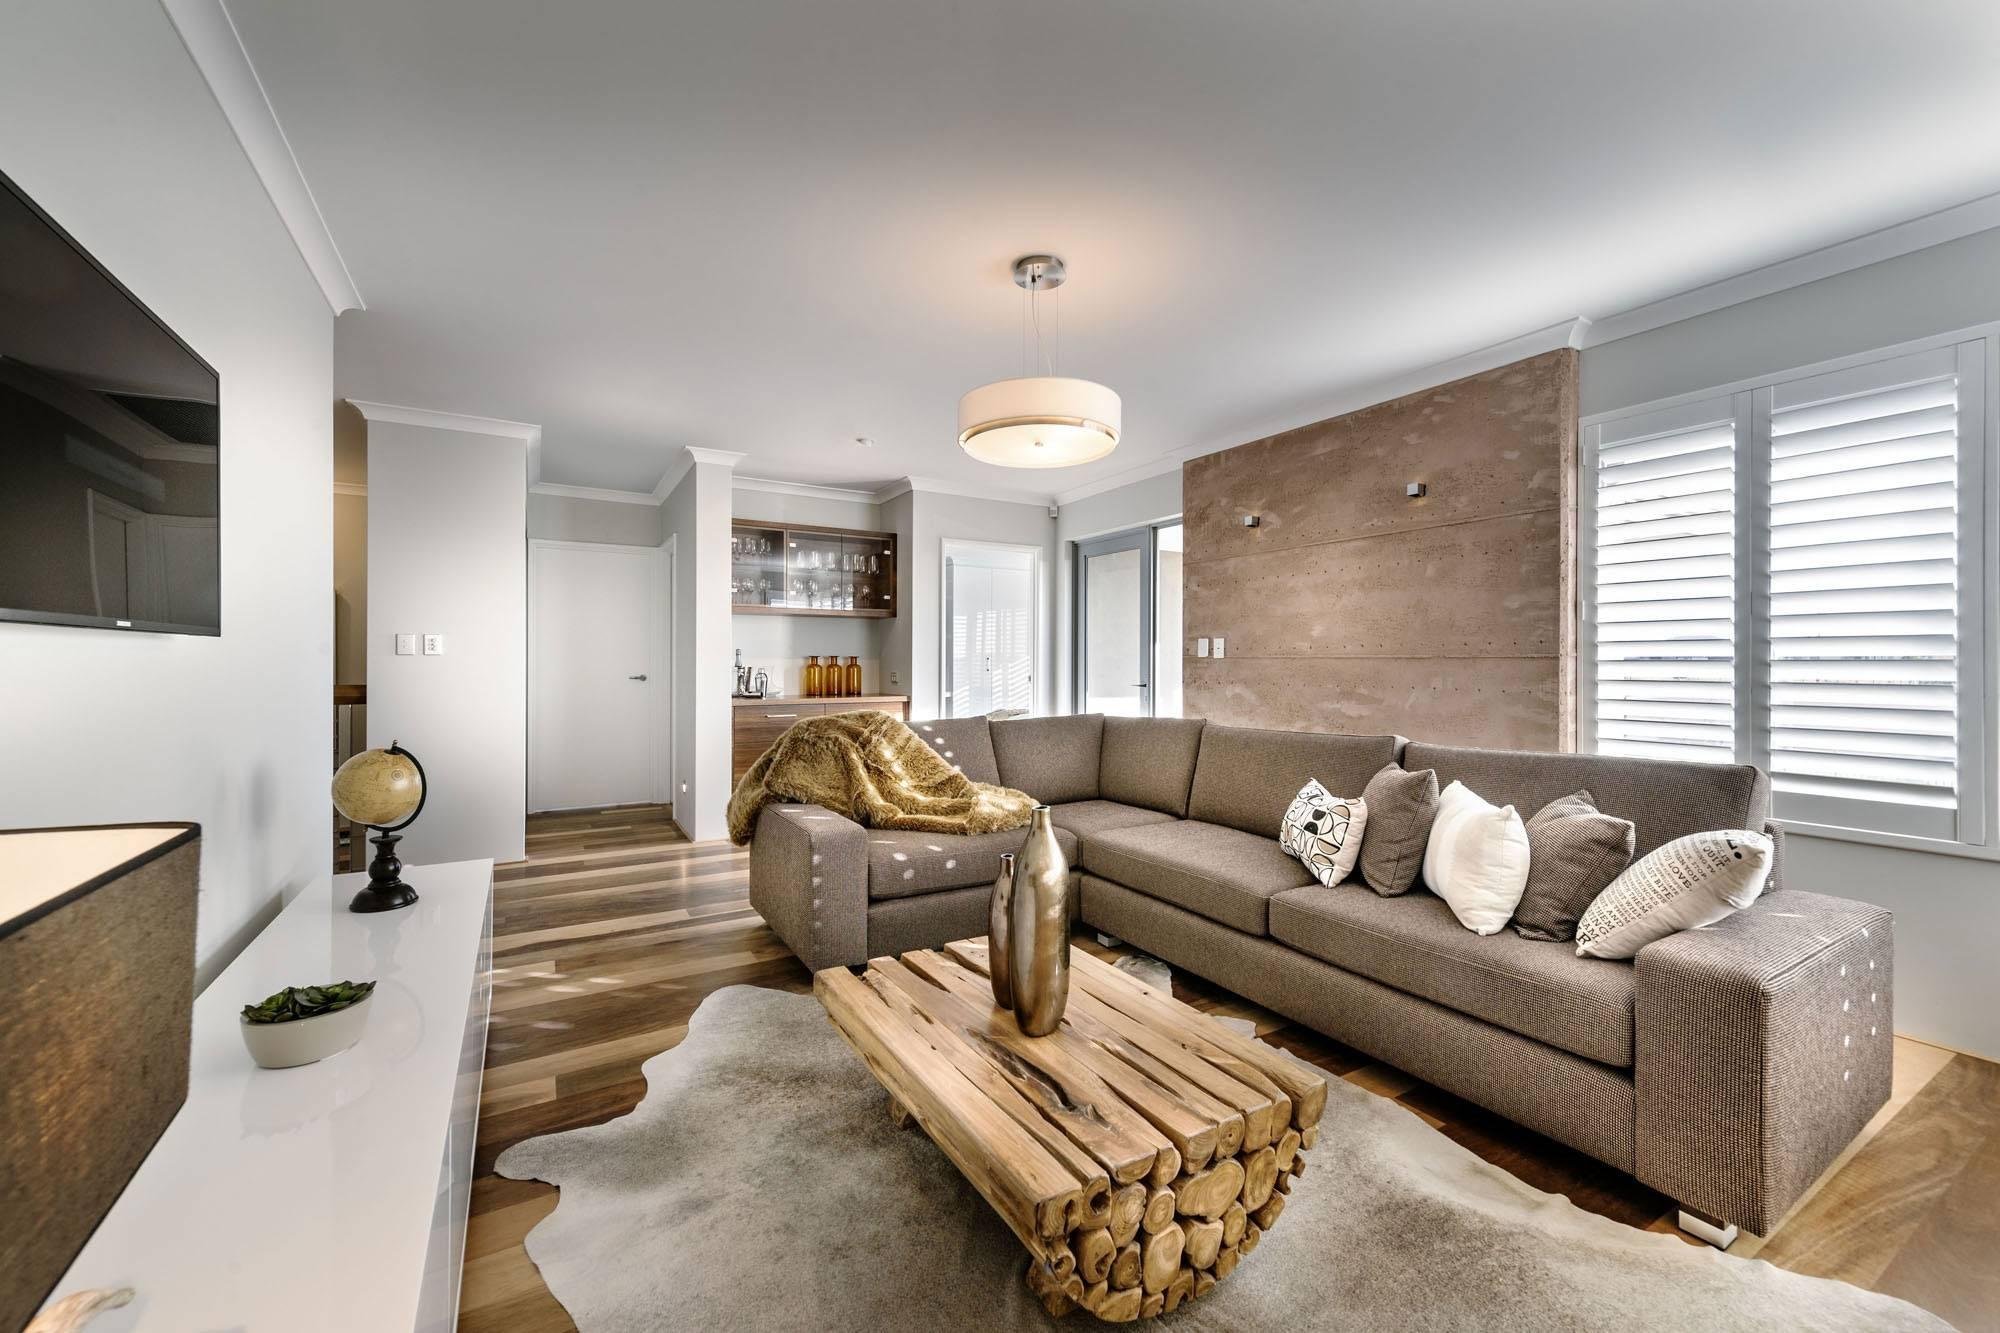 Chunky Wood Coffee Table, Sofa, Rug, Modern Home In Wandi, Perth within Chunky Wood Coffee Tables (Image 3 of 30)